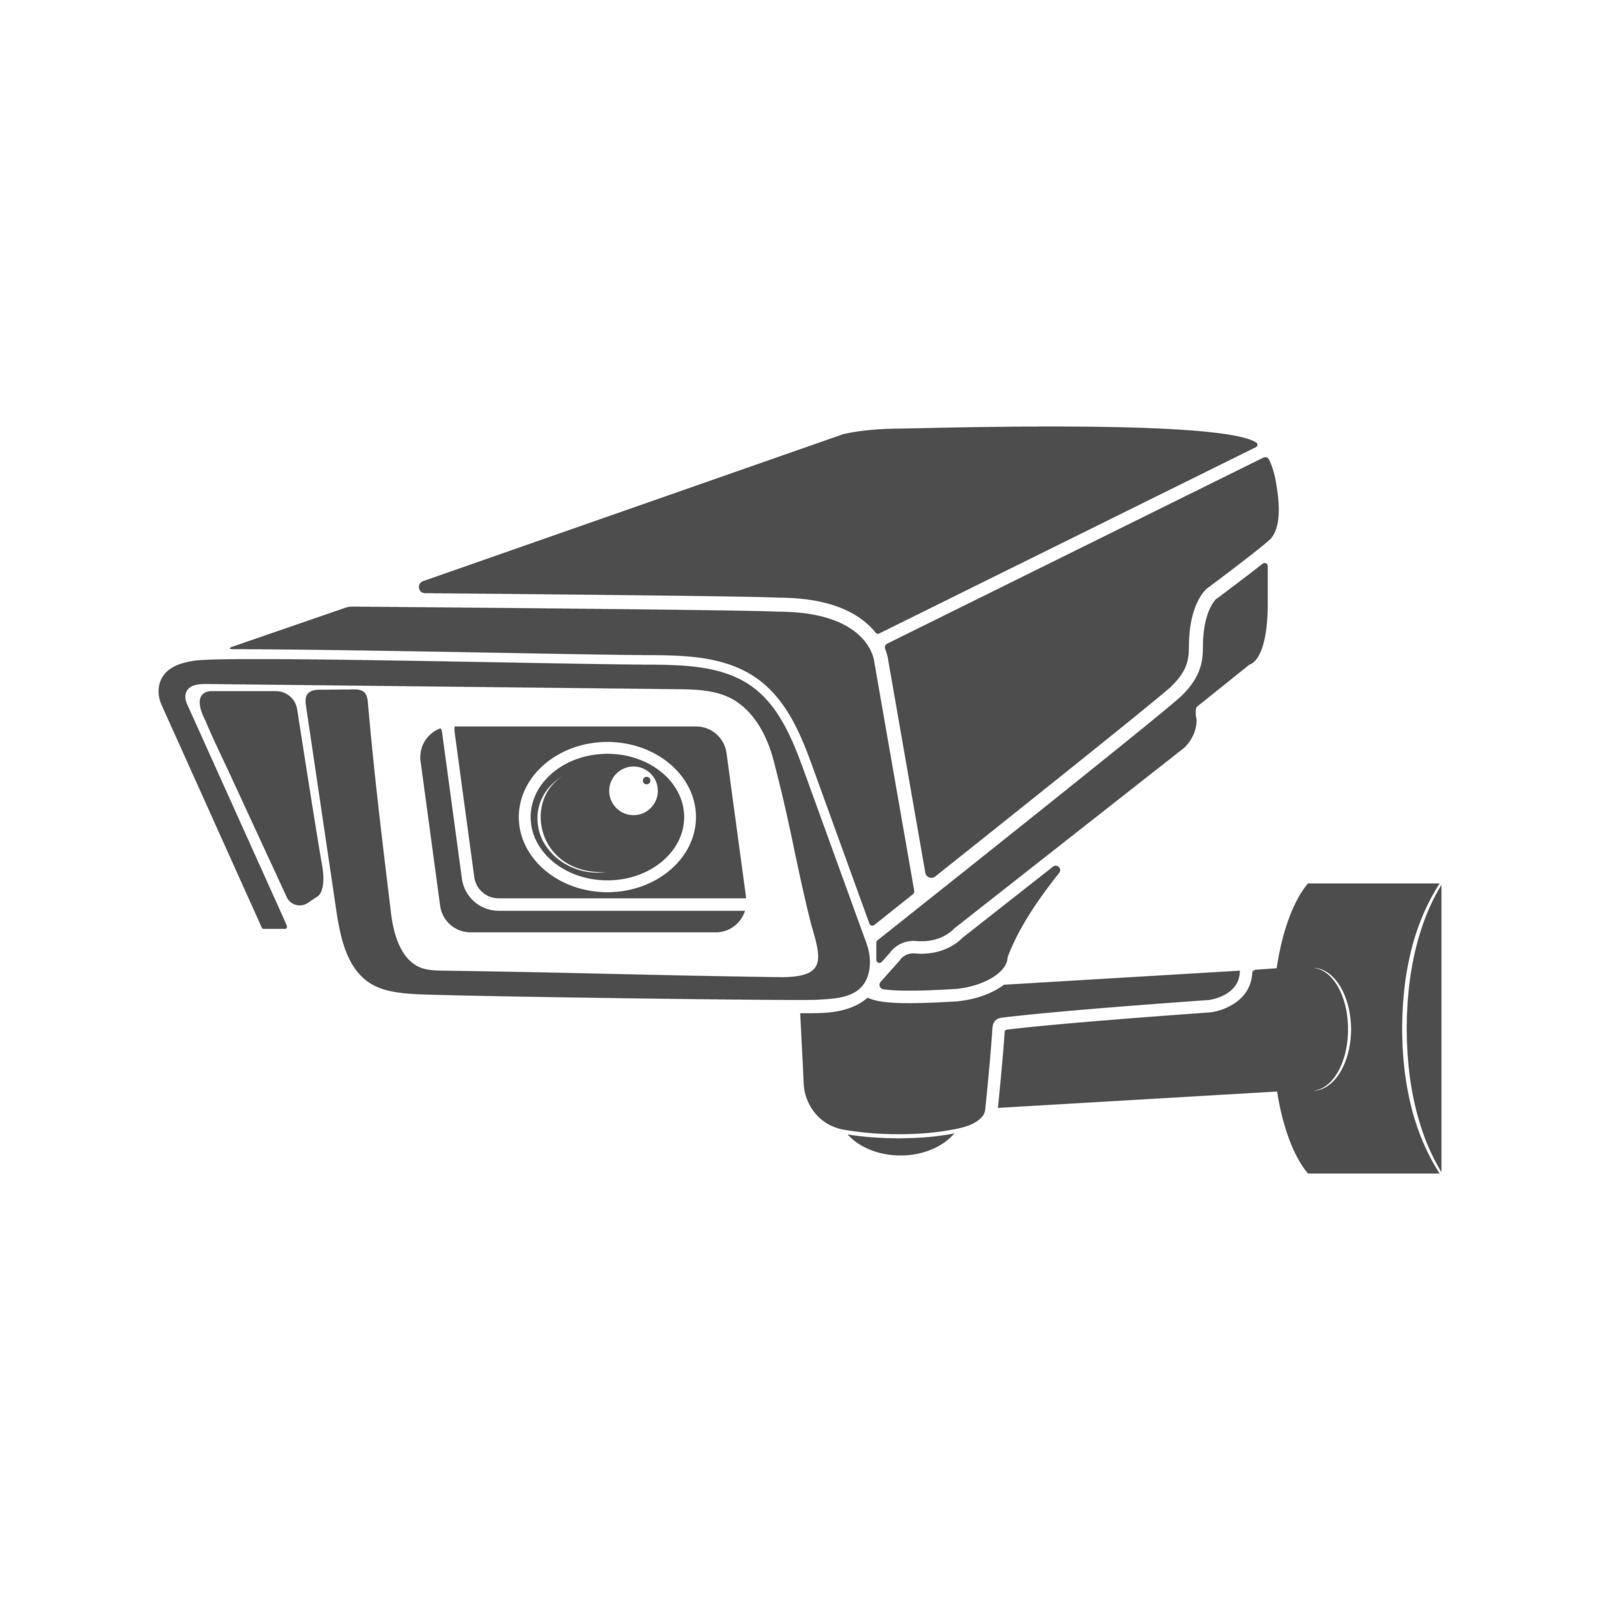 Video surveillance icon. Video camera icon, flat style.